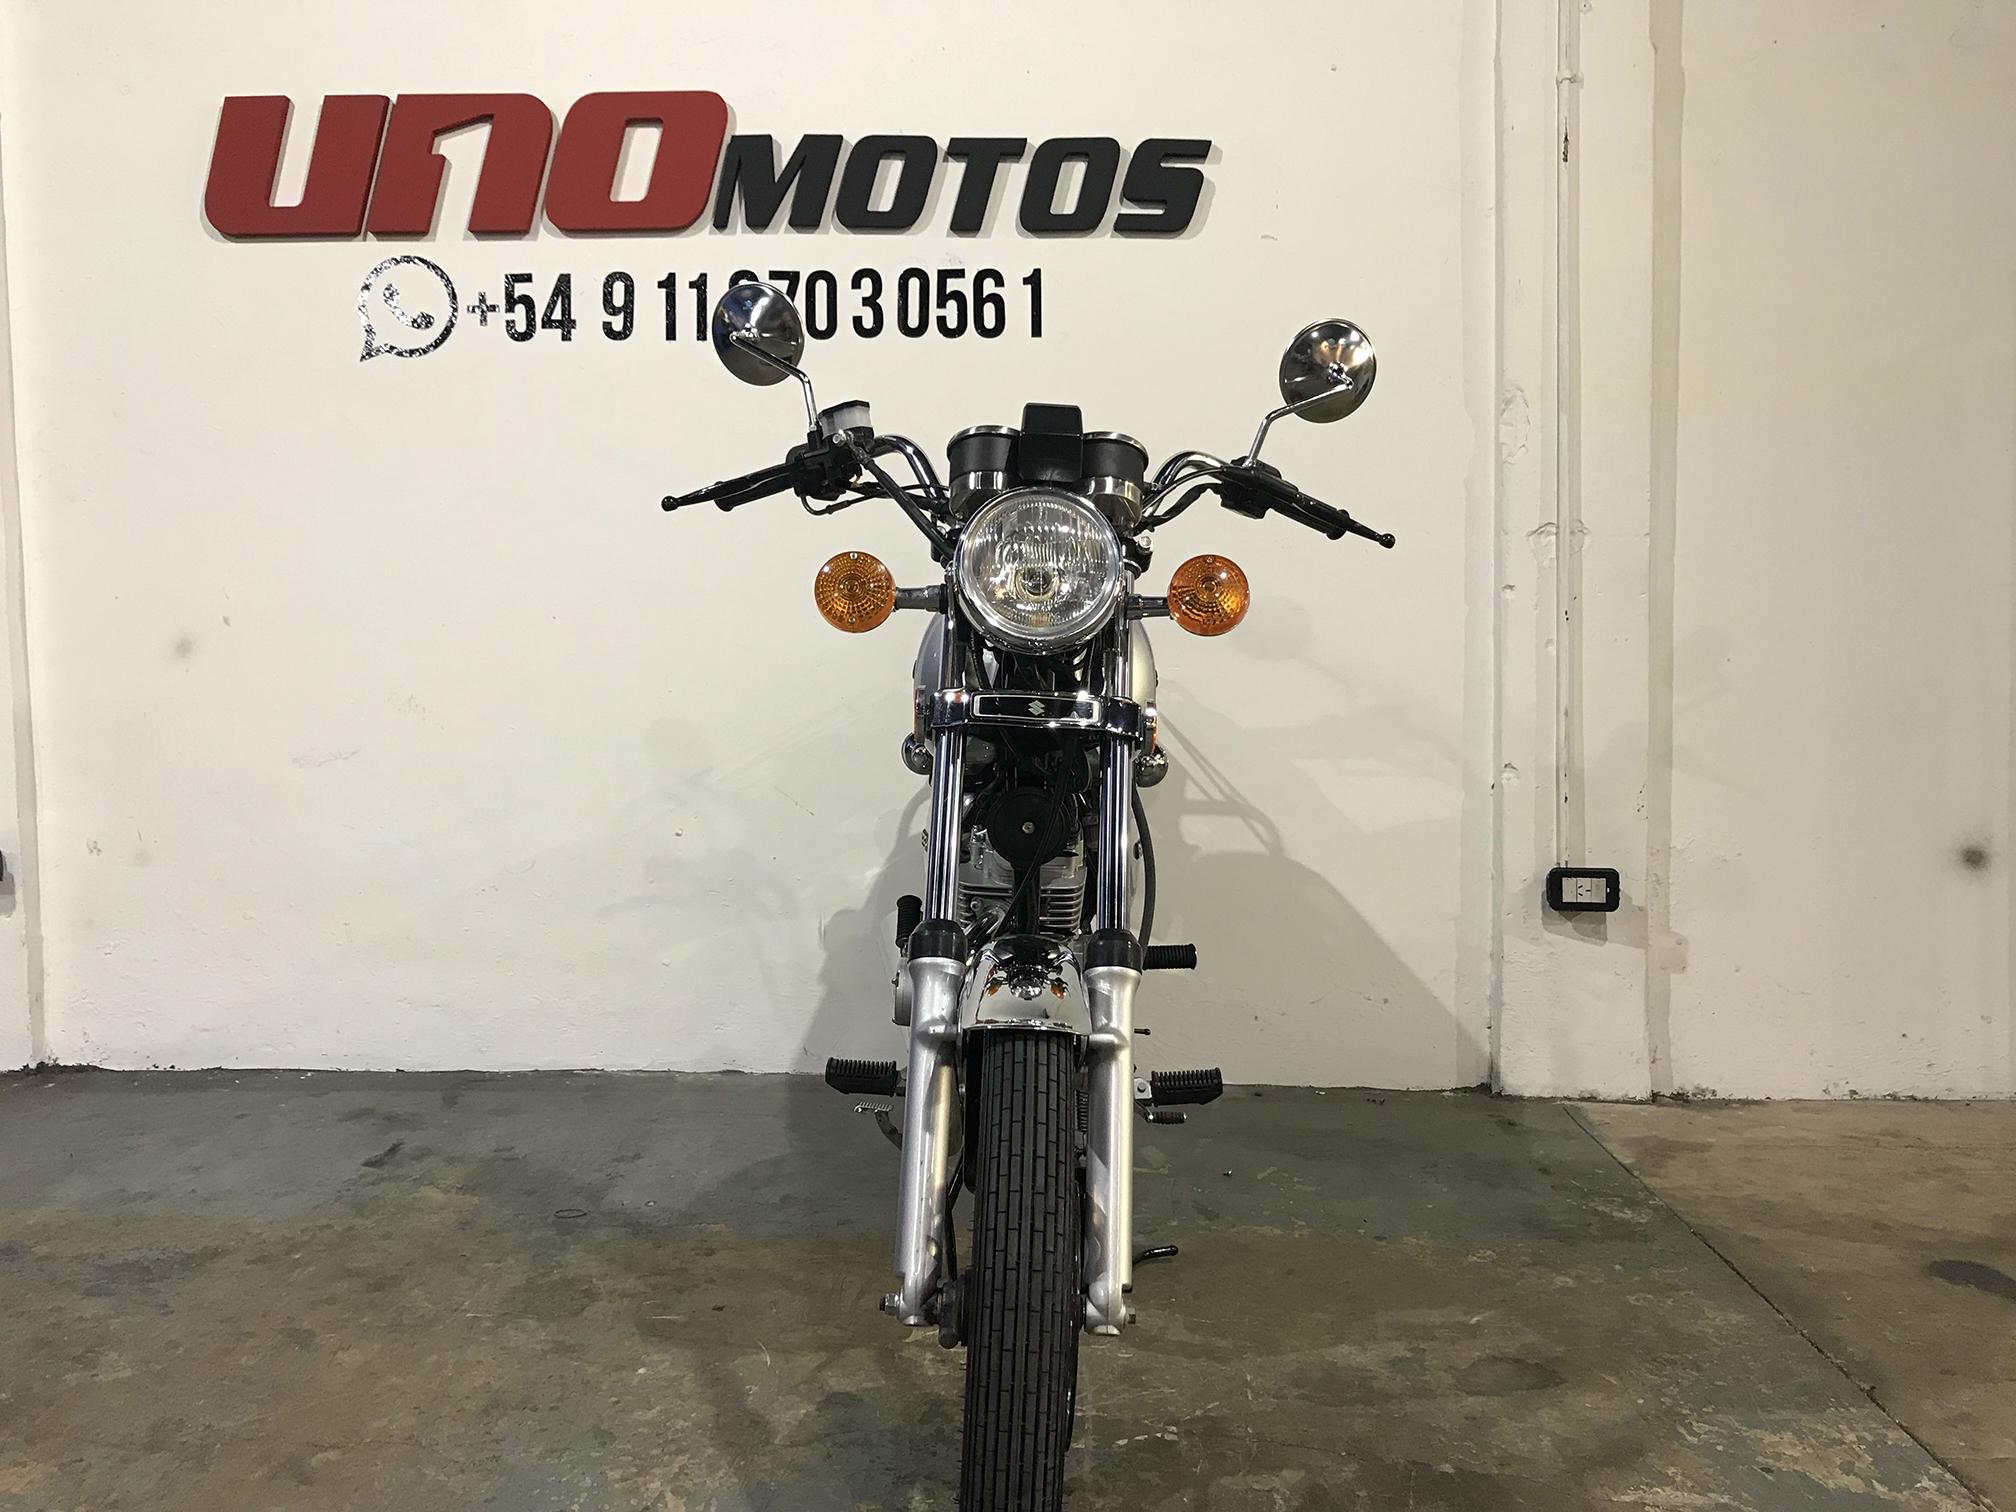 Moto Suzuki Gn 125 G usado 2016 con 3500 km INT 20517